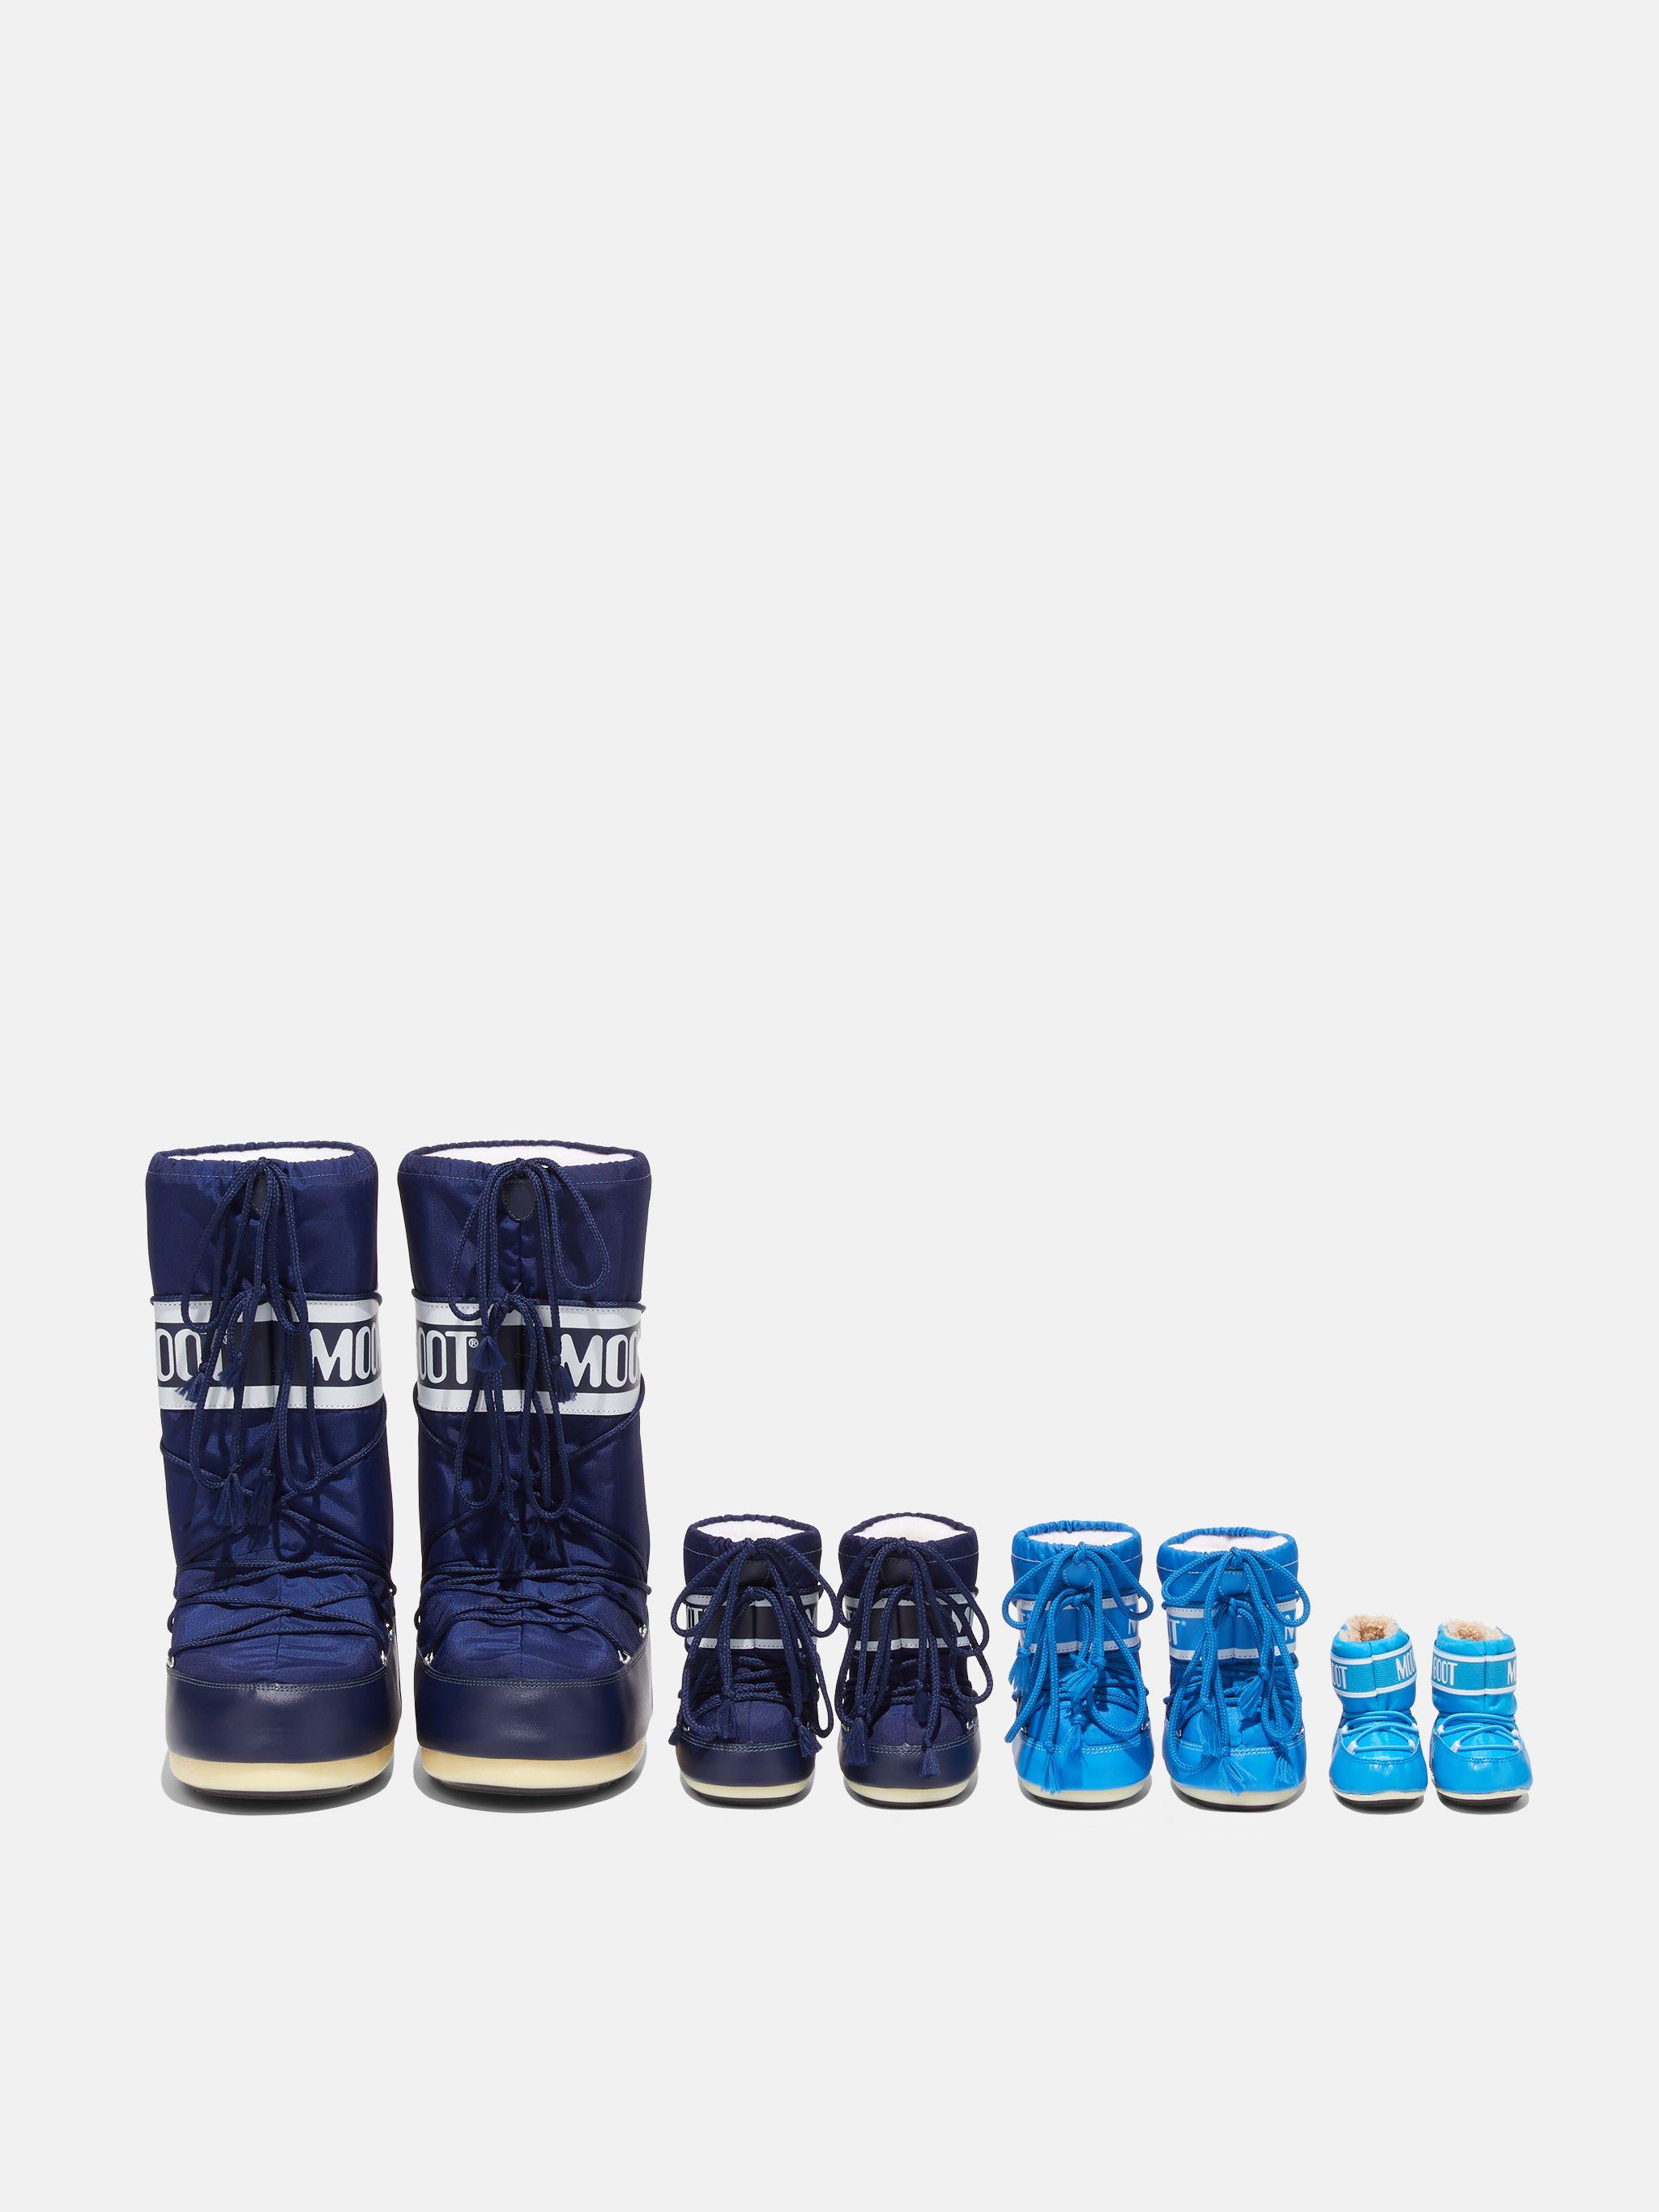 ICON MINI BLUE NYLON BOOTS